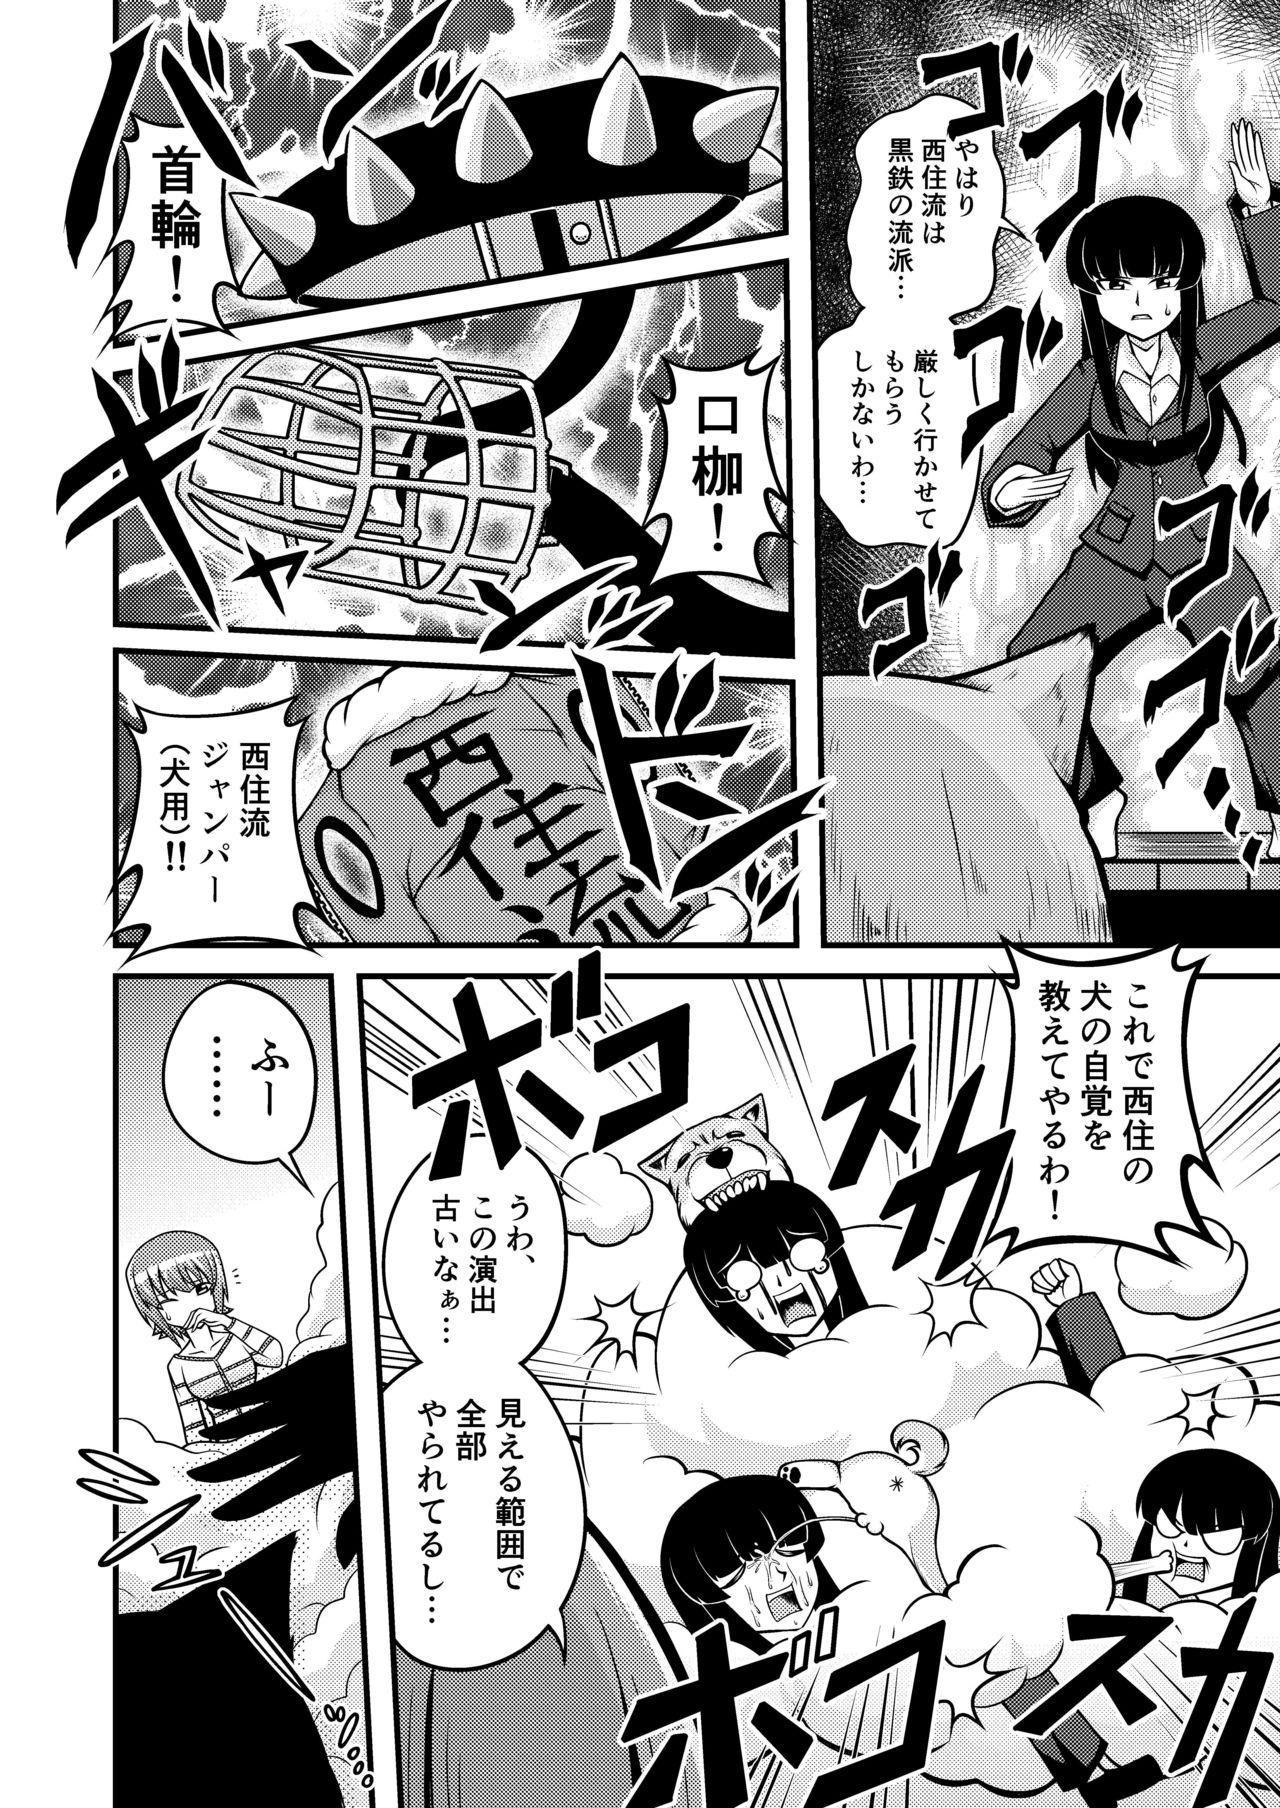 Garupan Iemoto Manga 『Iemoto no Inu』 5